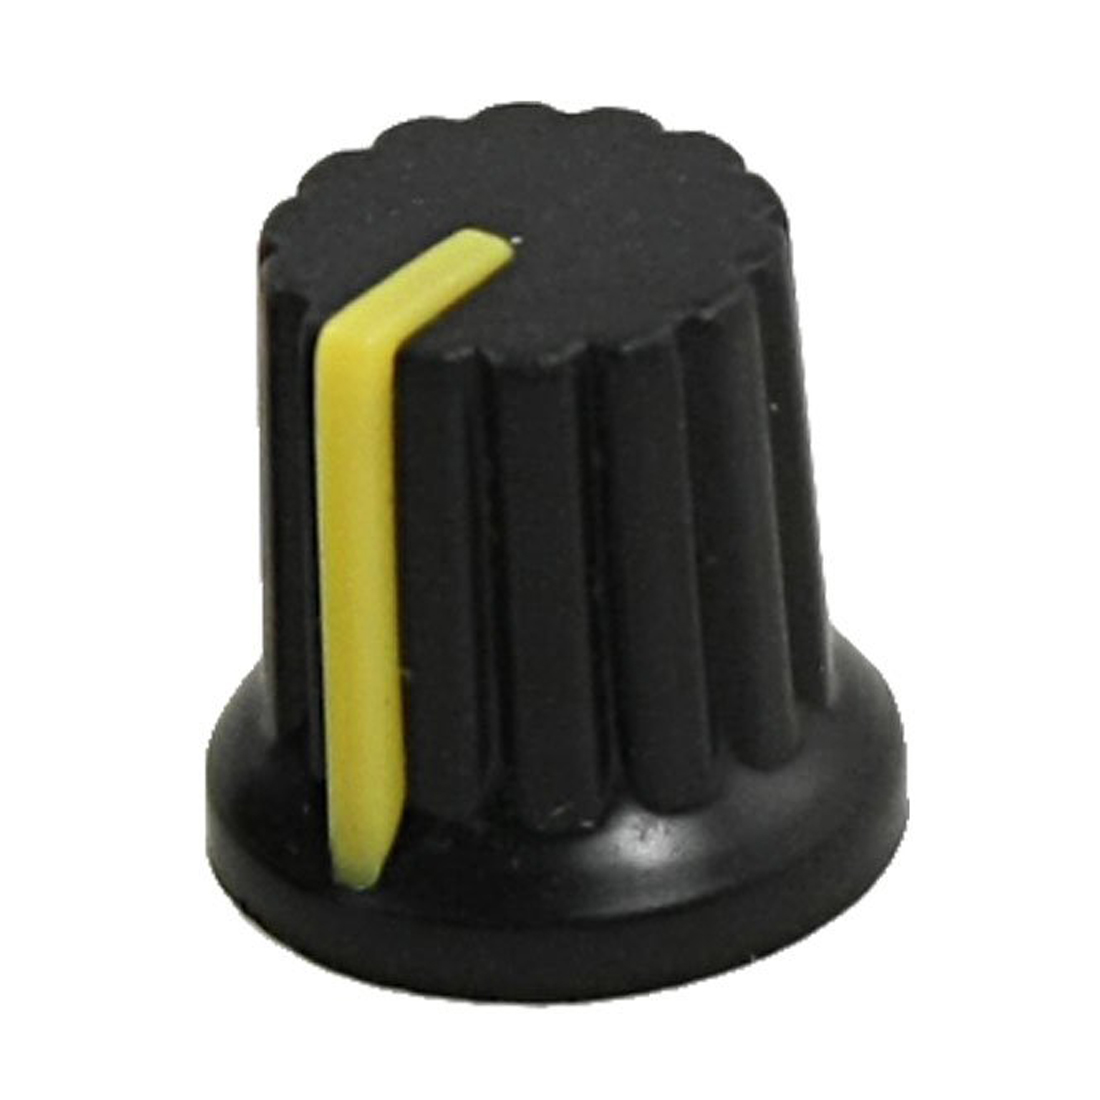 10 Pcs 6mm Shaft Hole Dia Knurled Grip Potentiometer Pot Knobs Caps